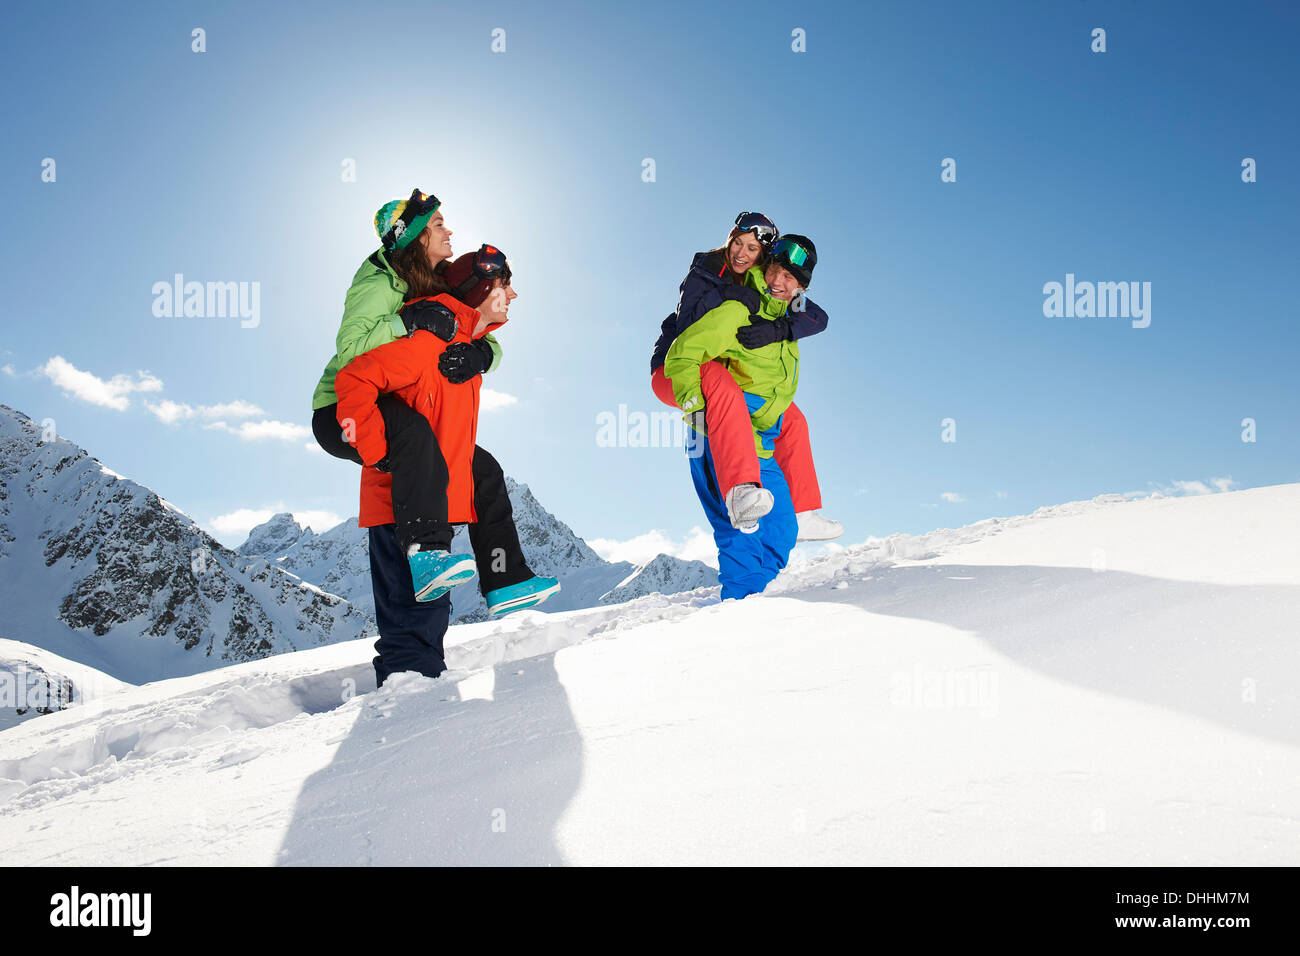 Amigos dando piggy backs en nieve, Kuhtai, Austria Foto de stock